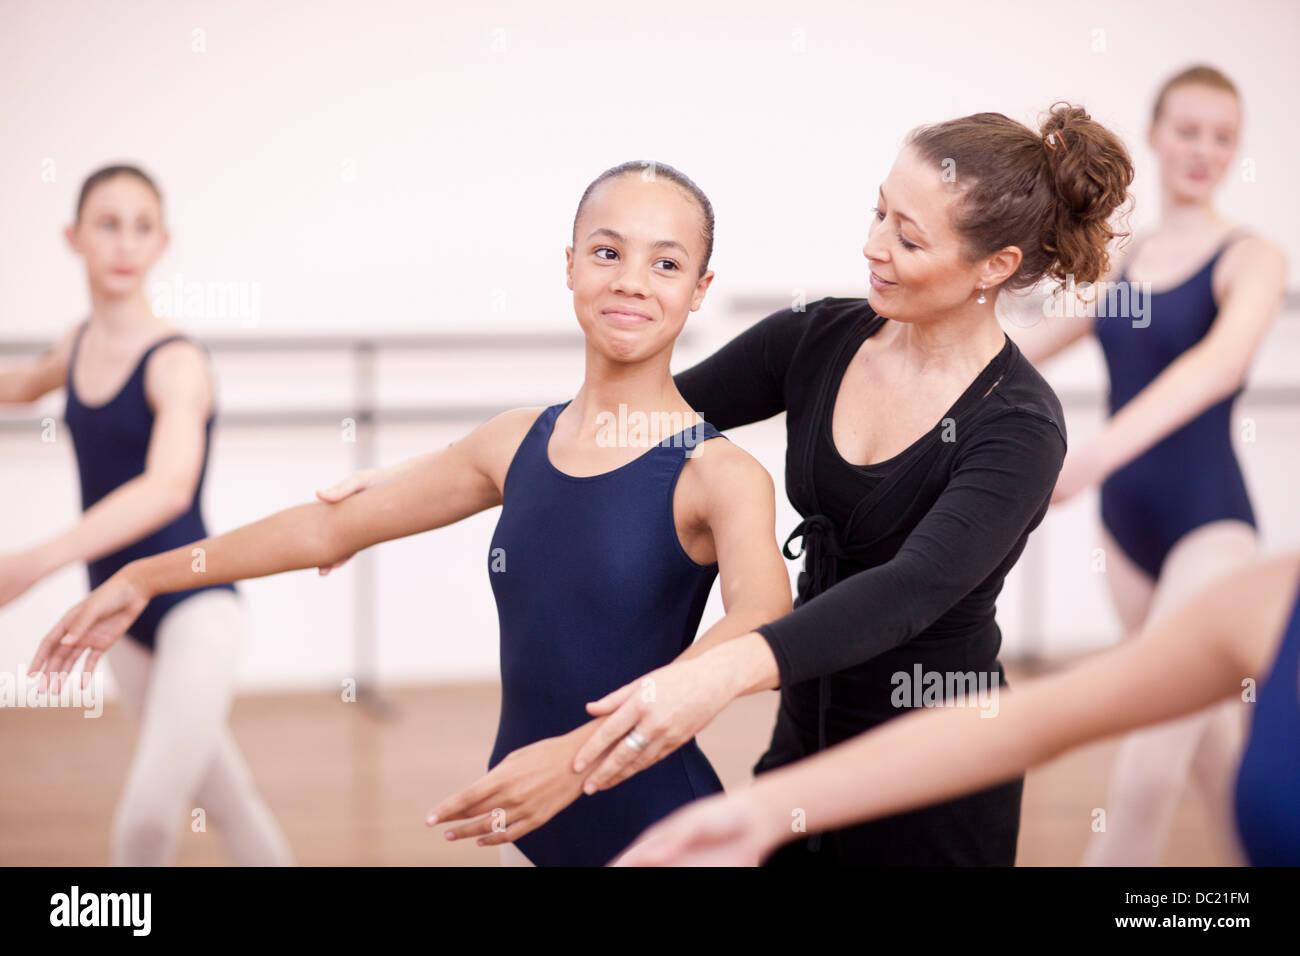 Profesor brazos de ajuste de tímida bailarina adolescente Imagen De Stock